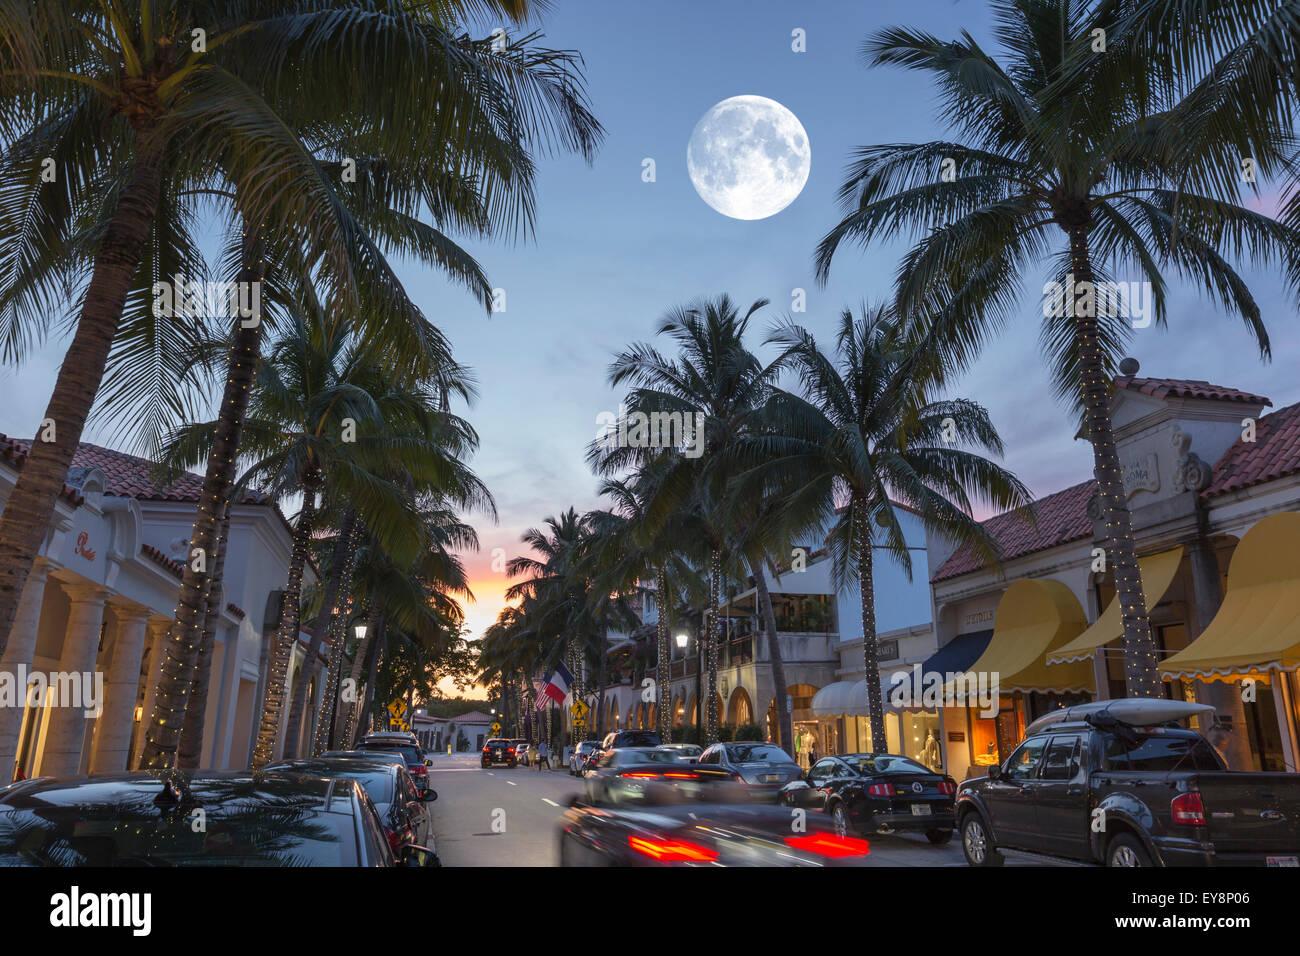 WORTH AVENUE PALM BEACH FLORIDA USA Stock Photo